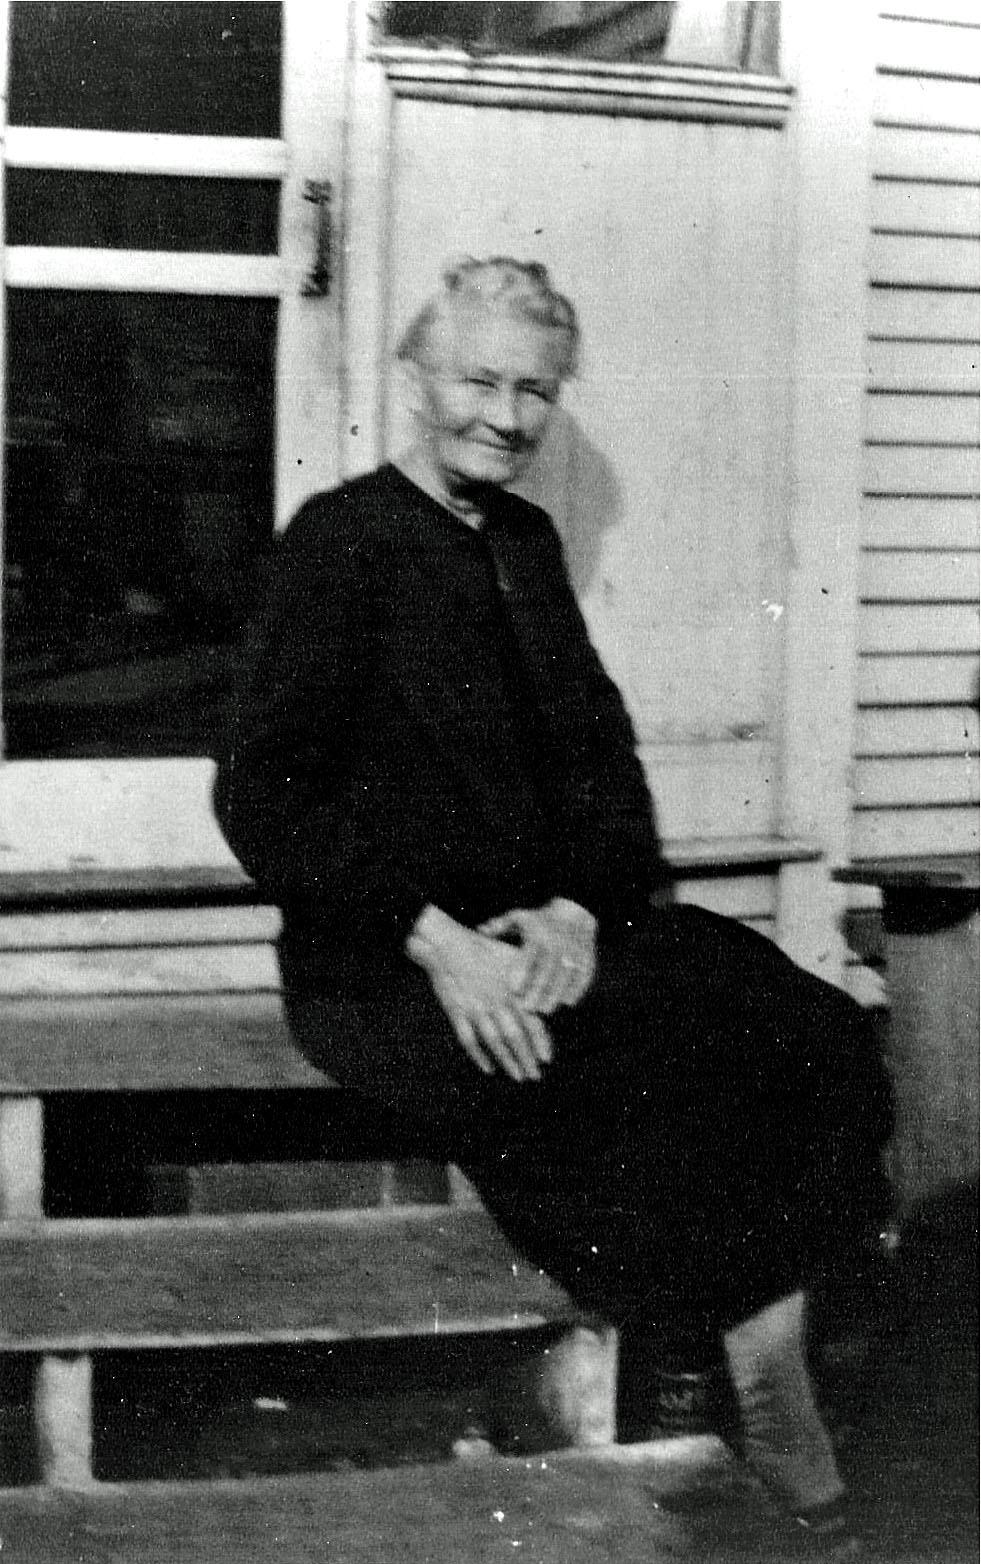 Photo of Margaret Ann Bruegger Kienlen, ca. 1938.